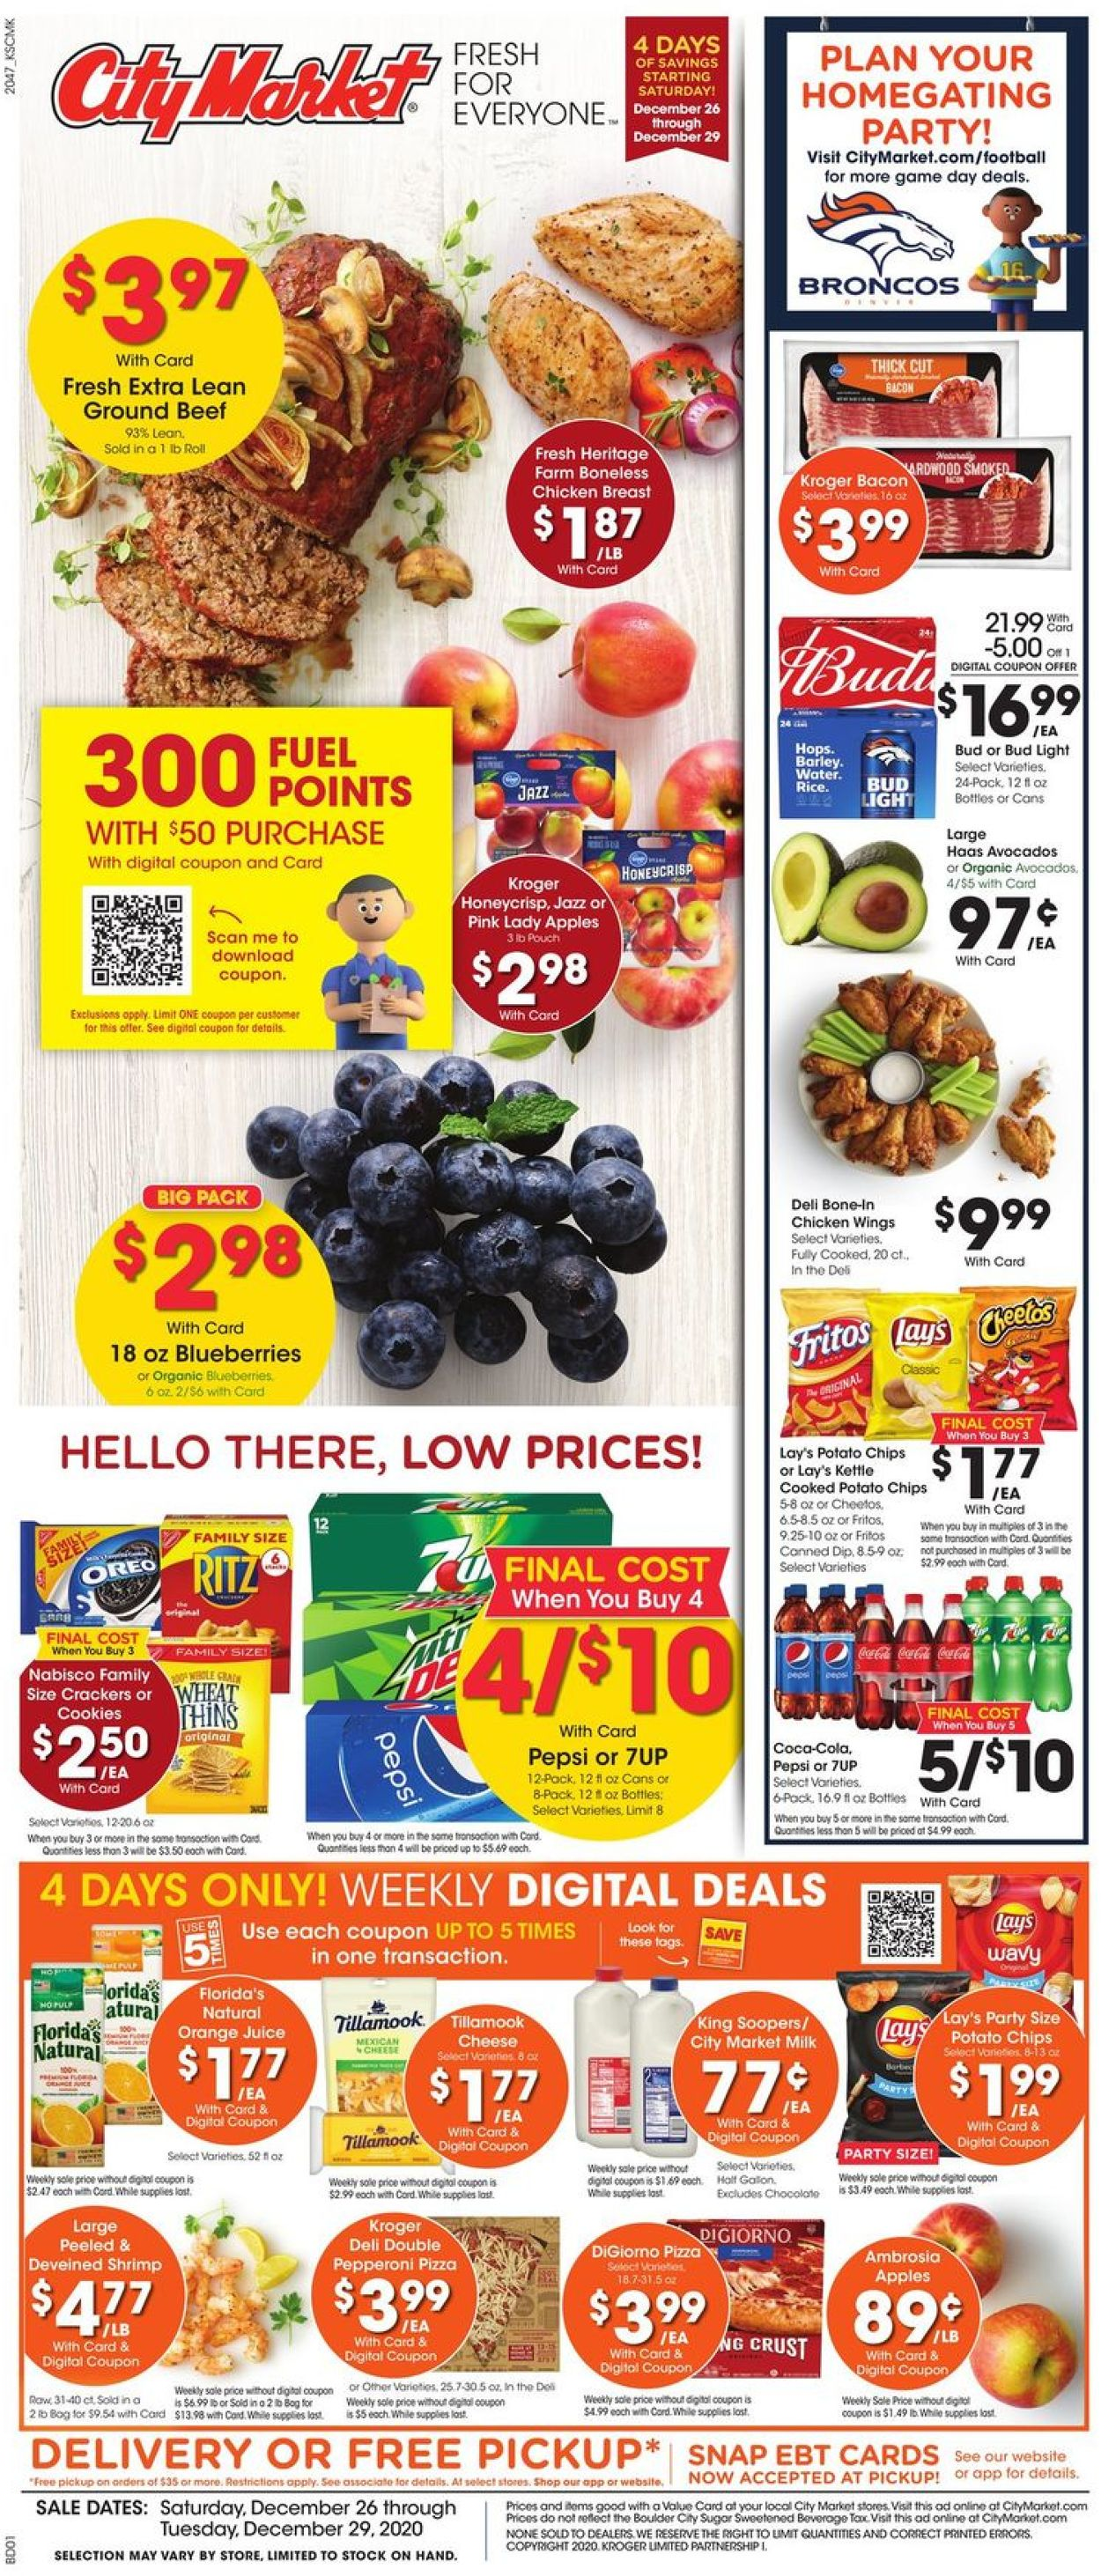 City Market Weekly Ad Circular - valid 12/26-12/29/2020